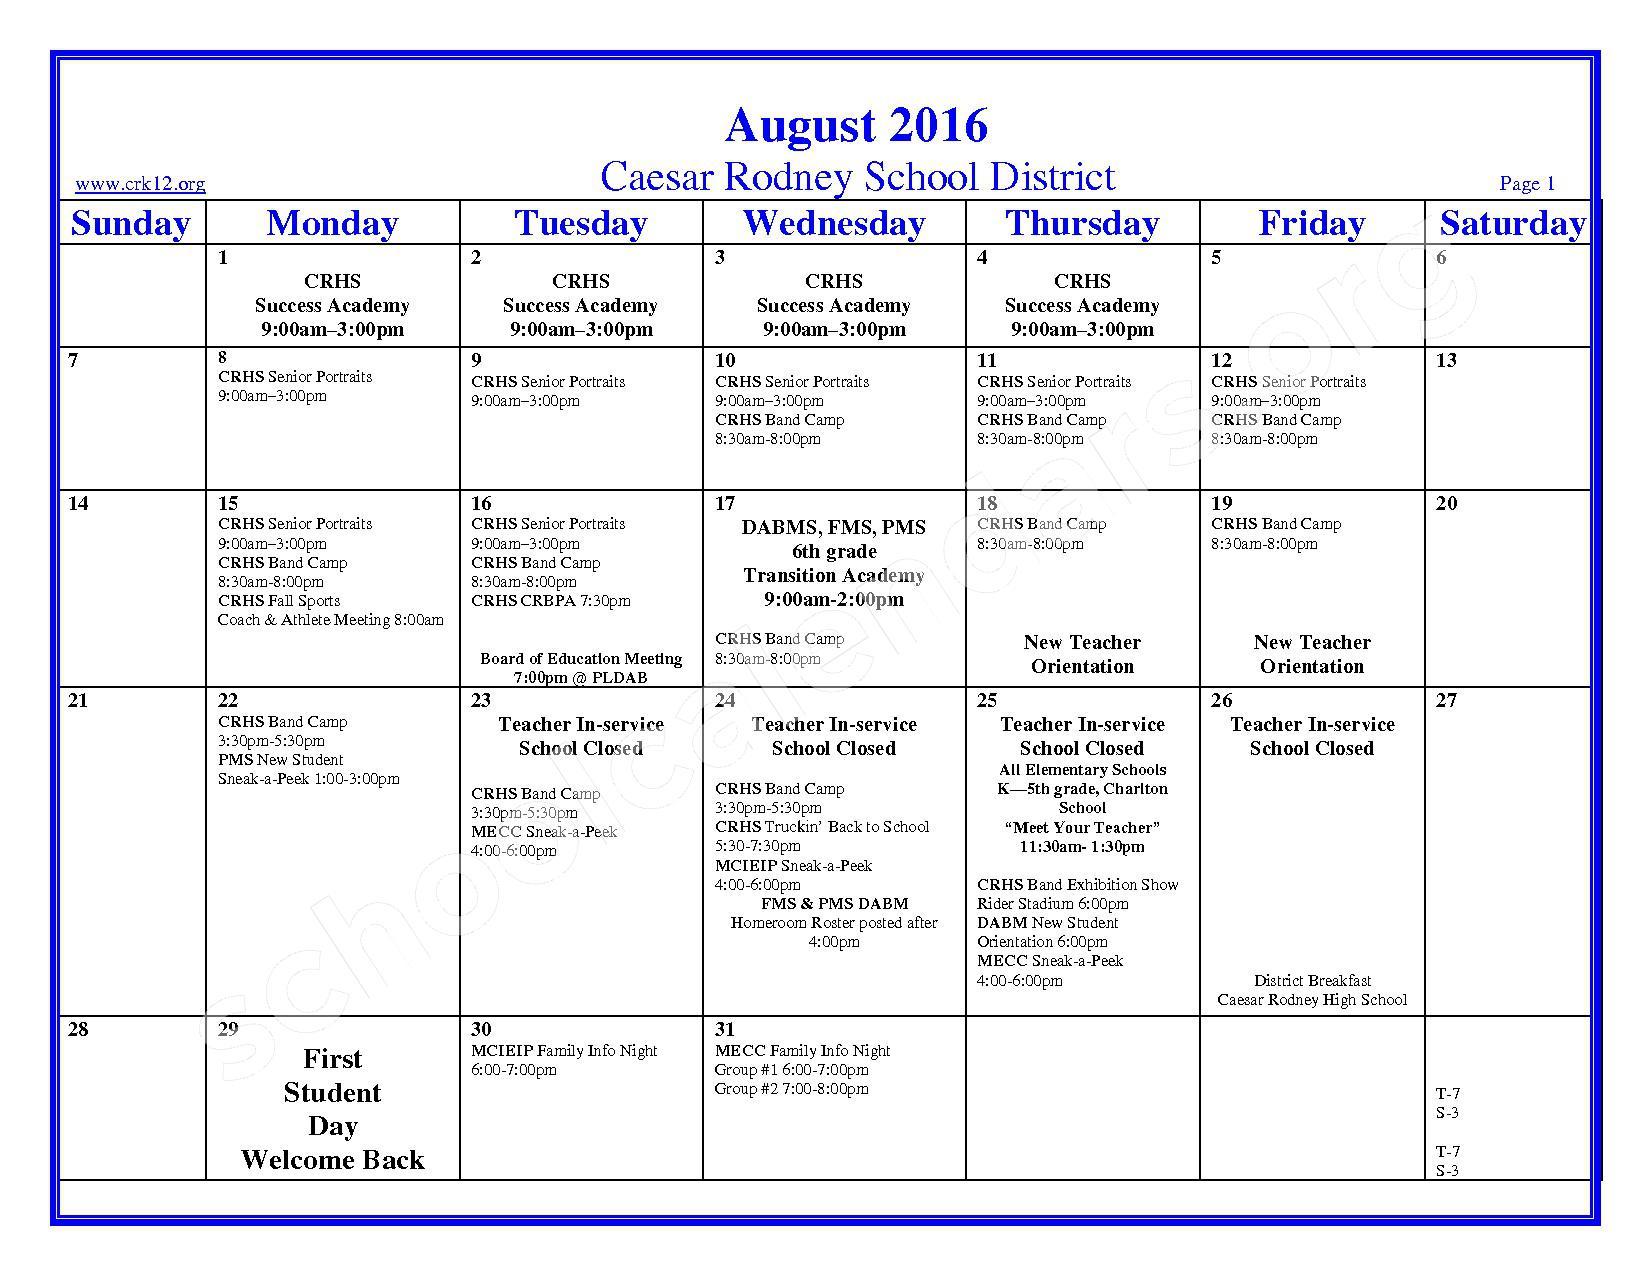 2016 - 2017 School Calendar – Brown (W. Reily) Elementary School – page 1